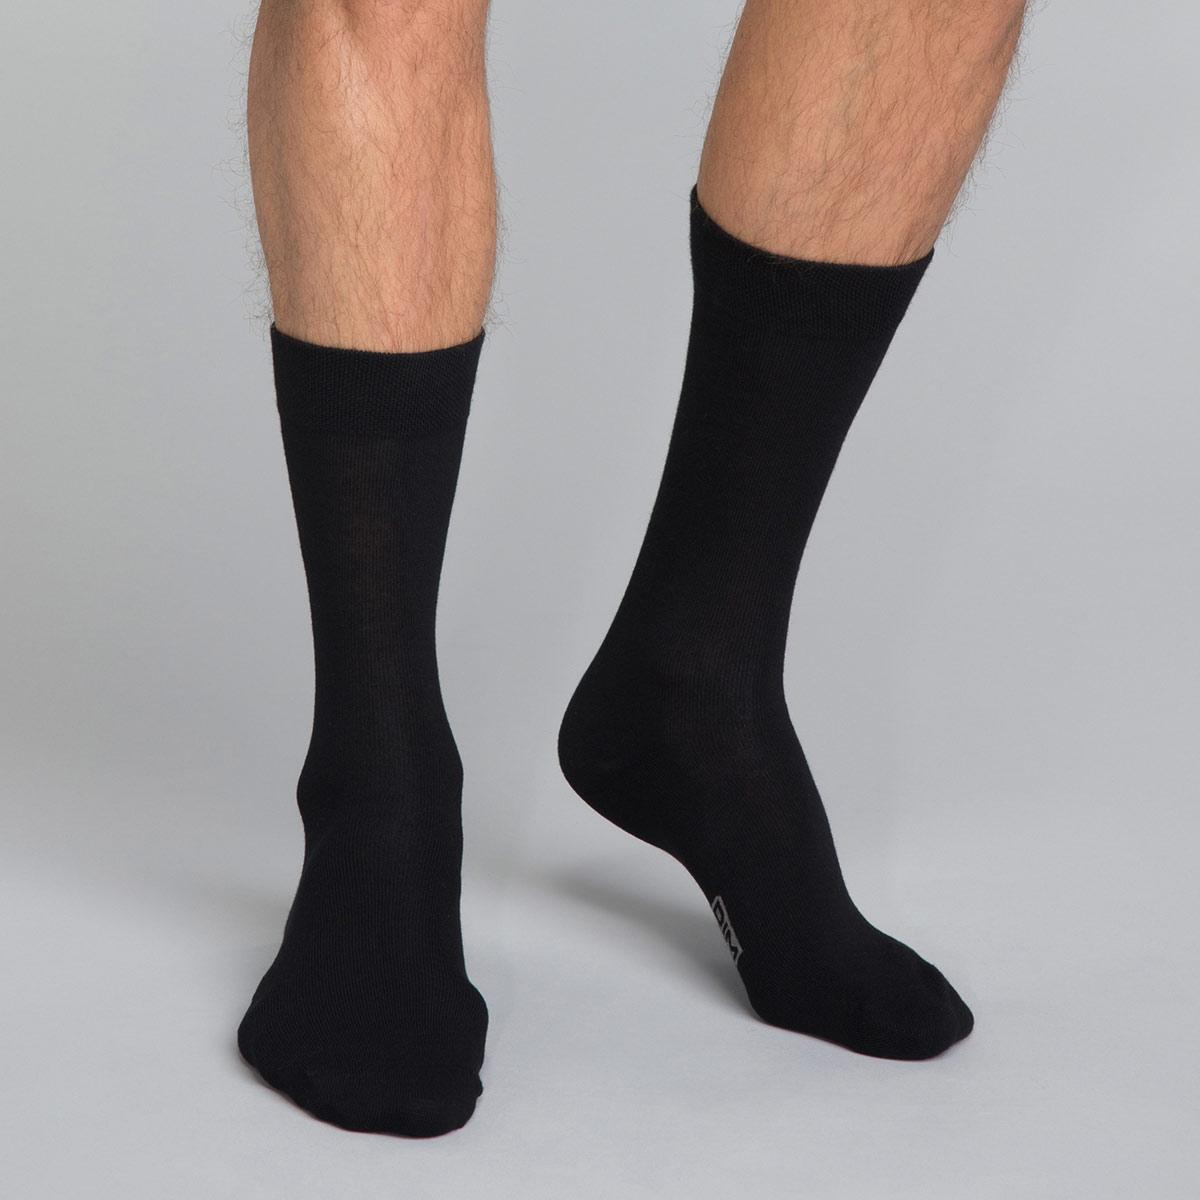 Mi-chaussettes coton X3 Basic Coton - DIM - Modalova